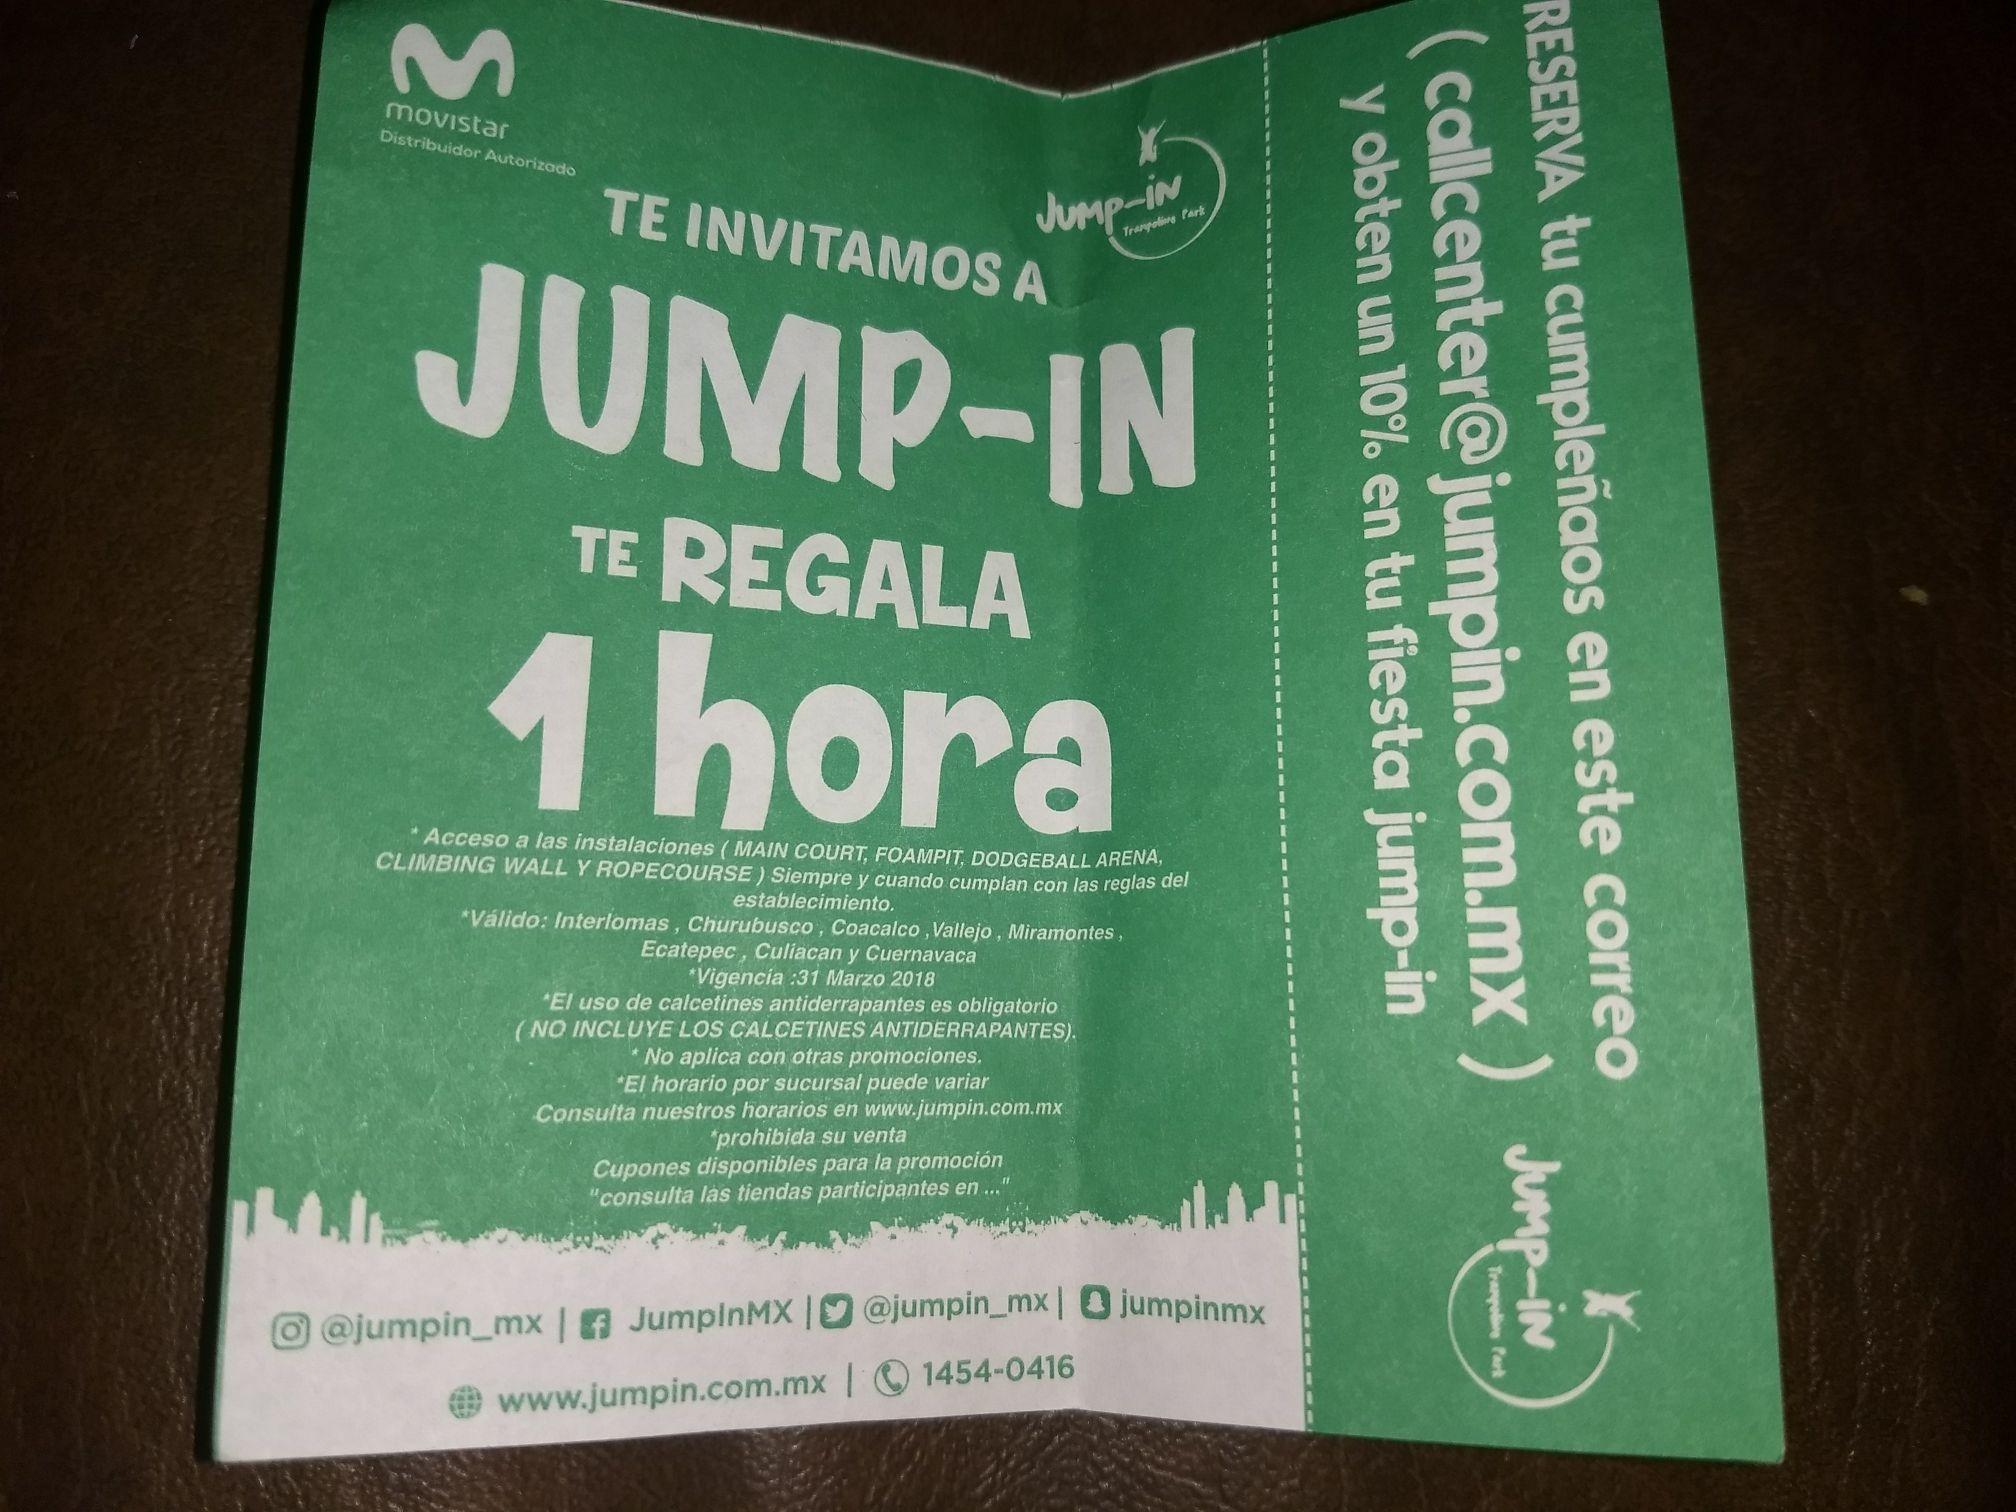 Jump-in Premio movístar al recargar $300